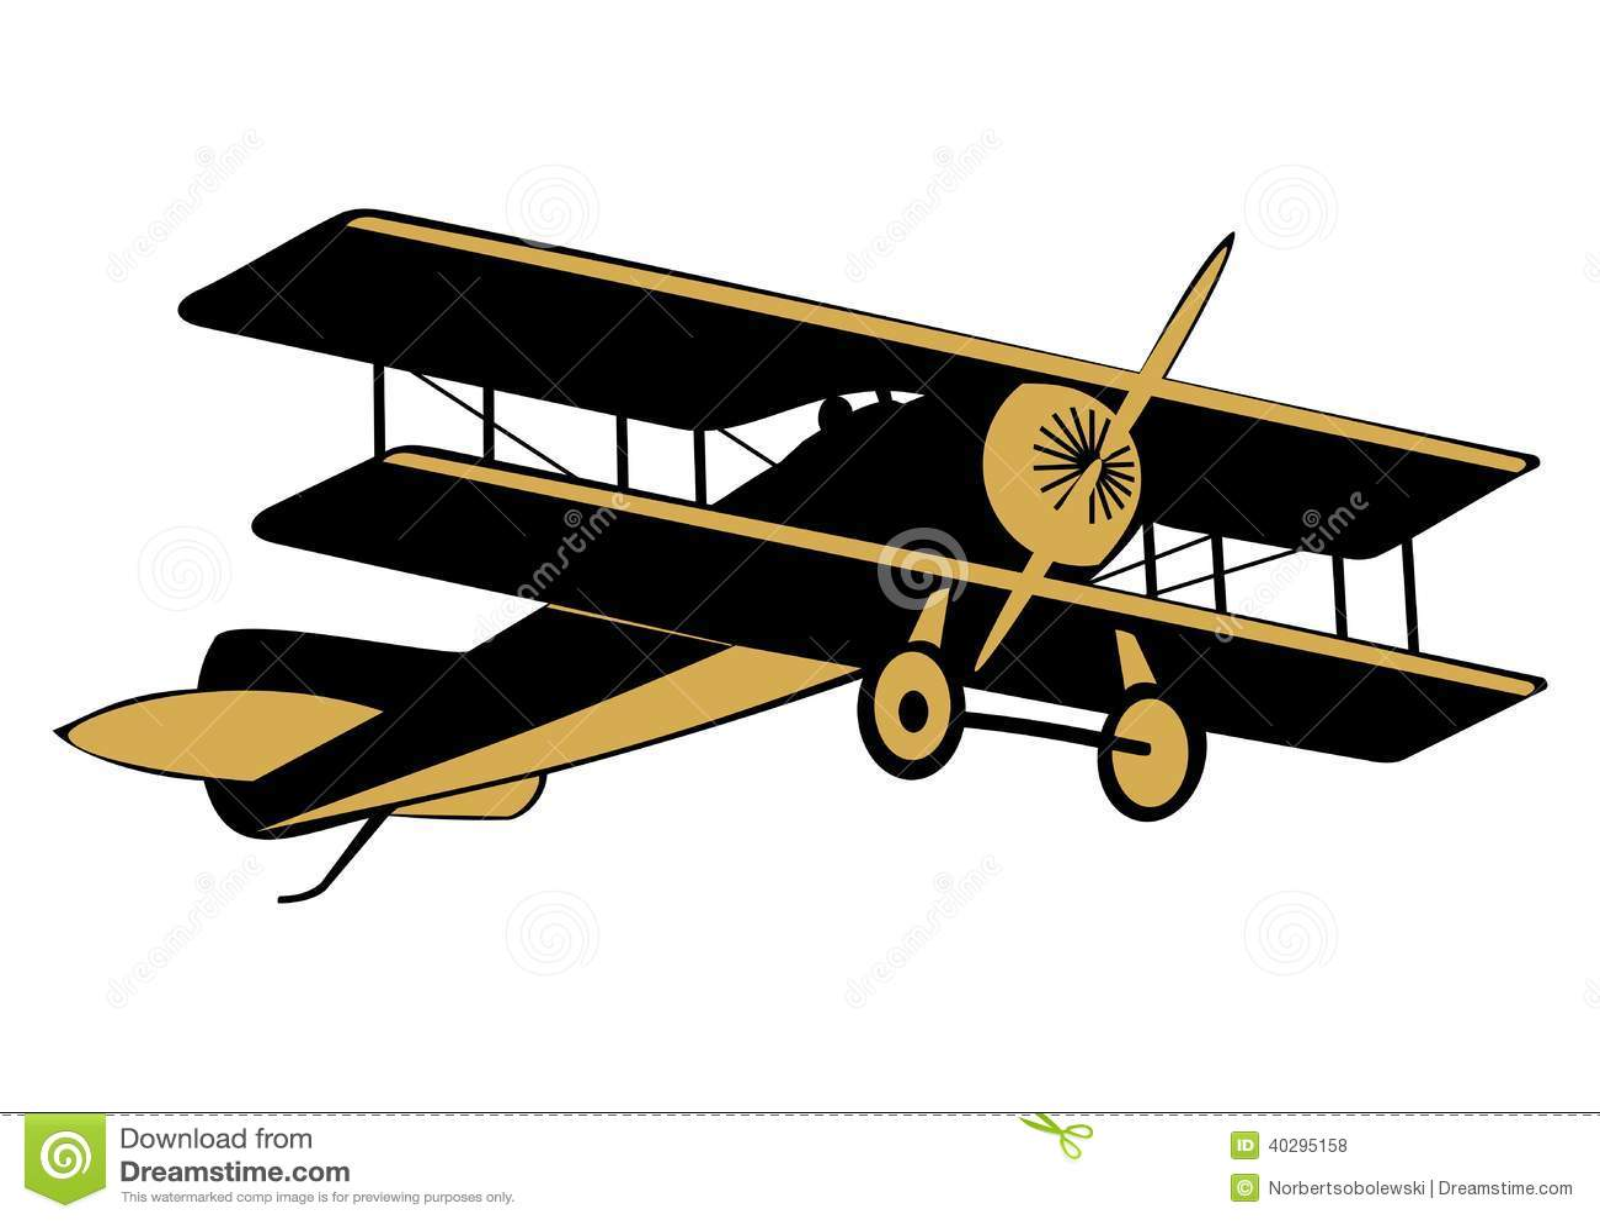 vintage airplane clipart - photo #32